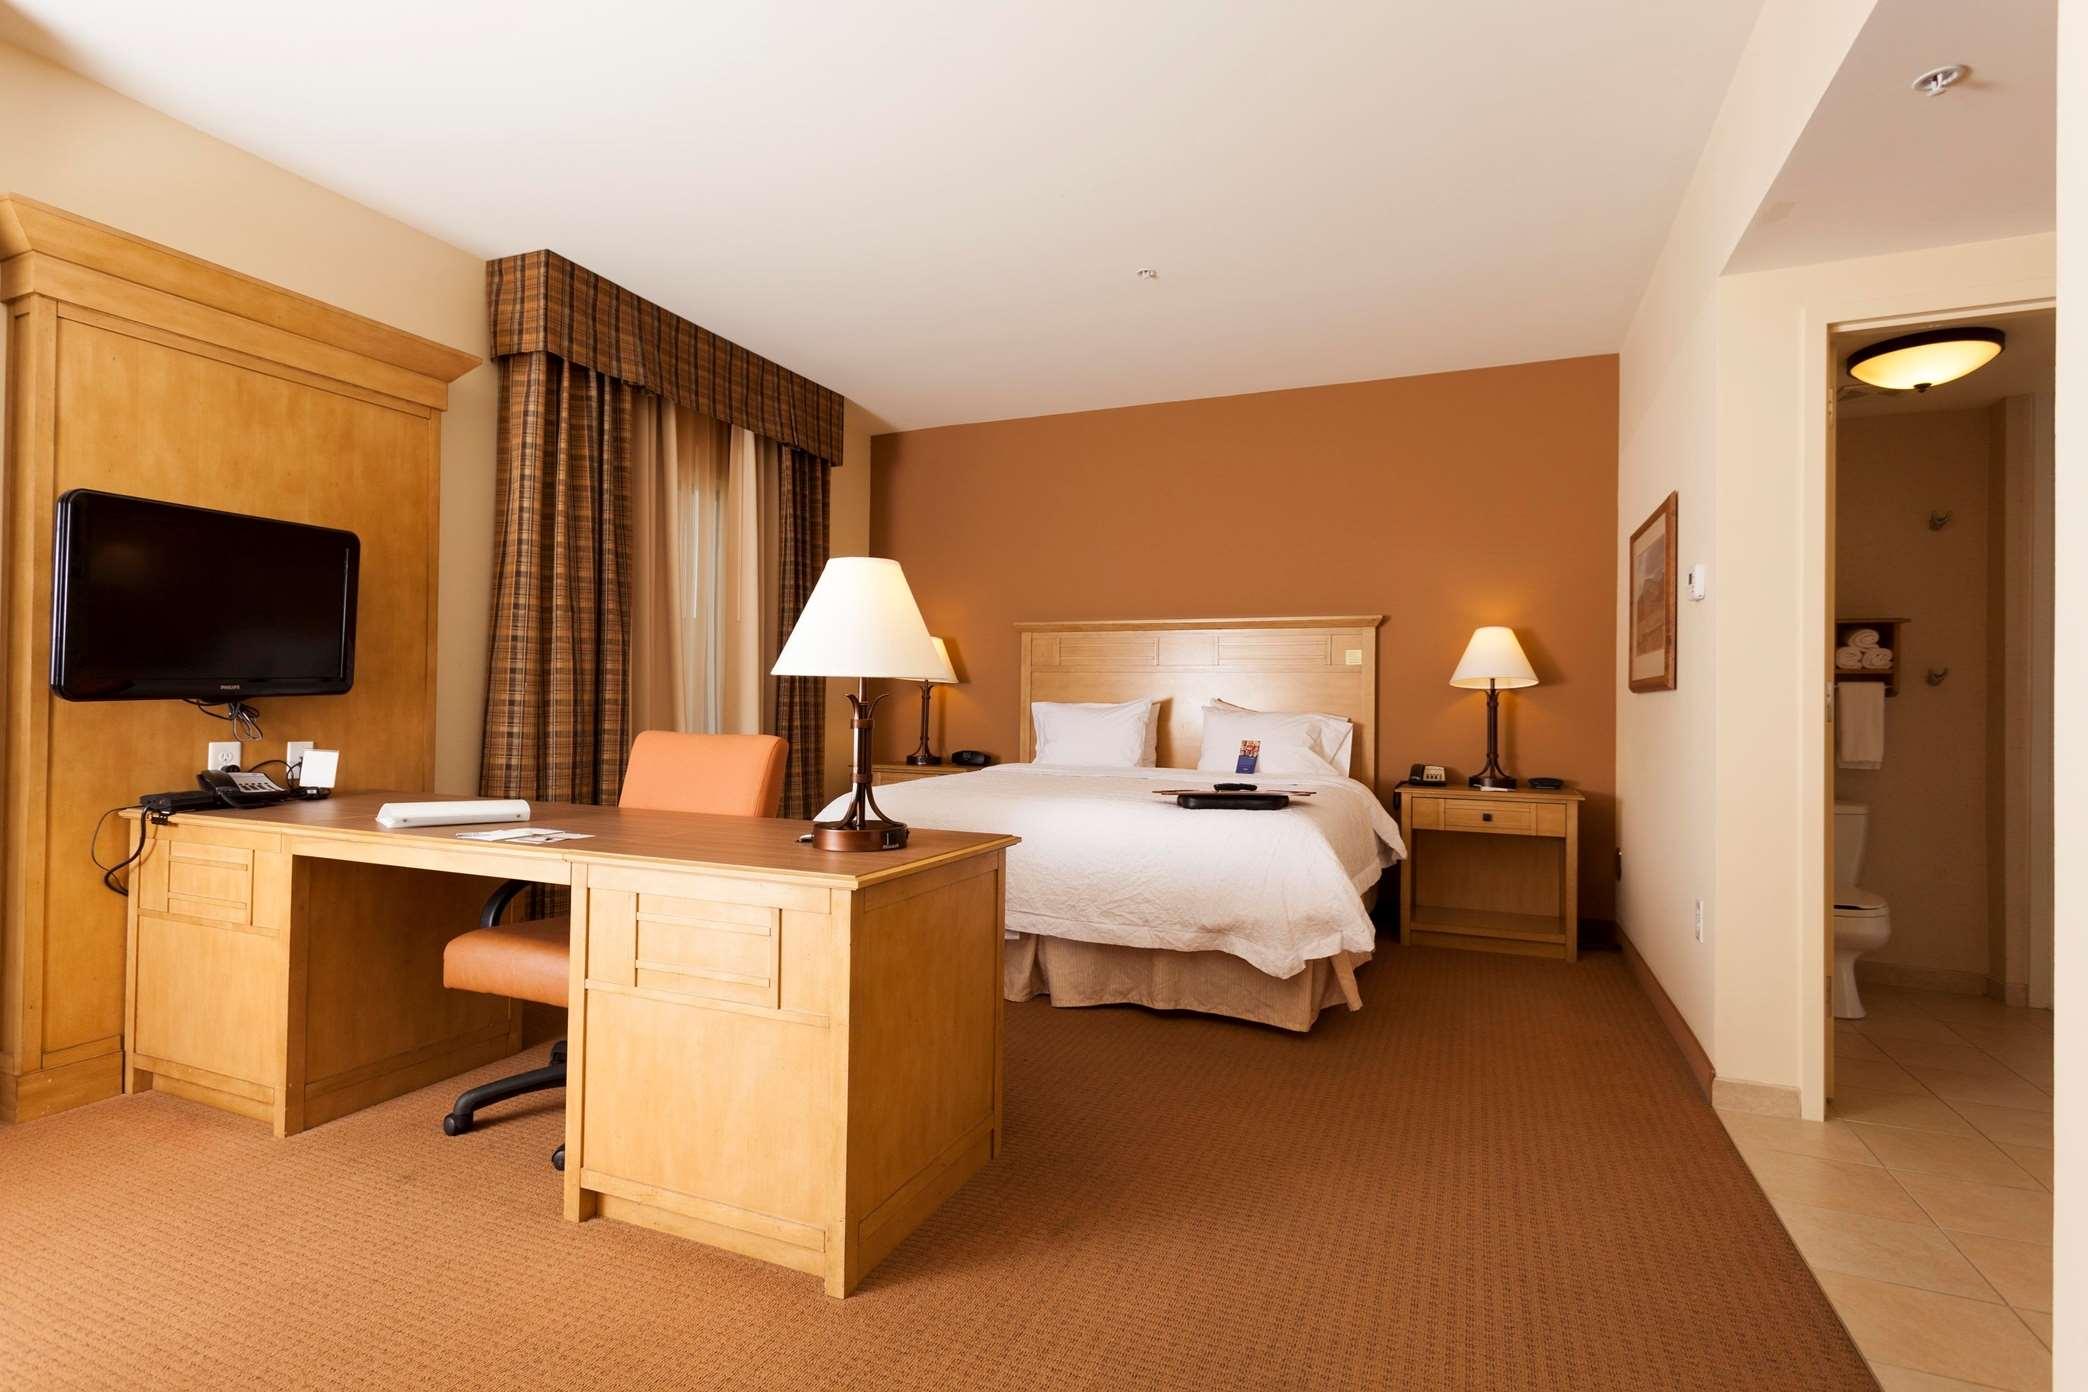 Hampton Inn & Suites Riverton image 16